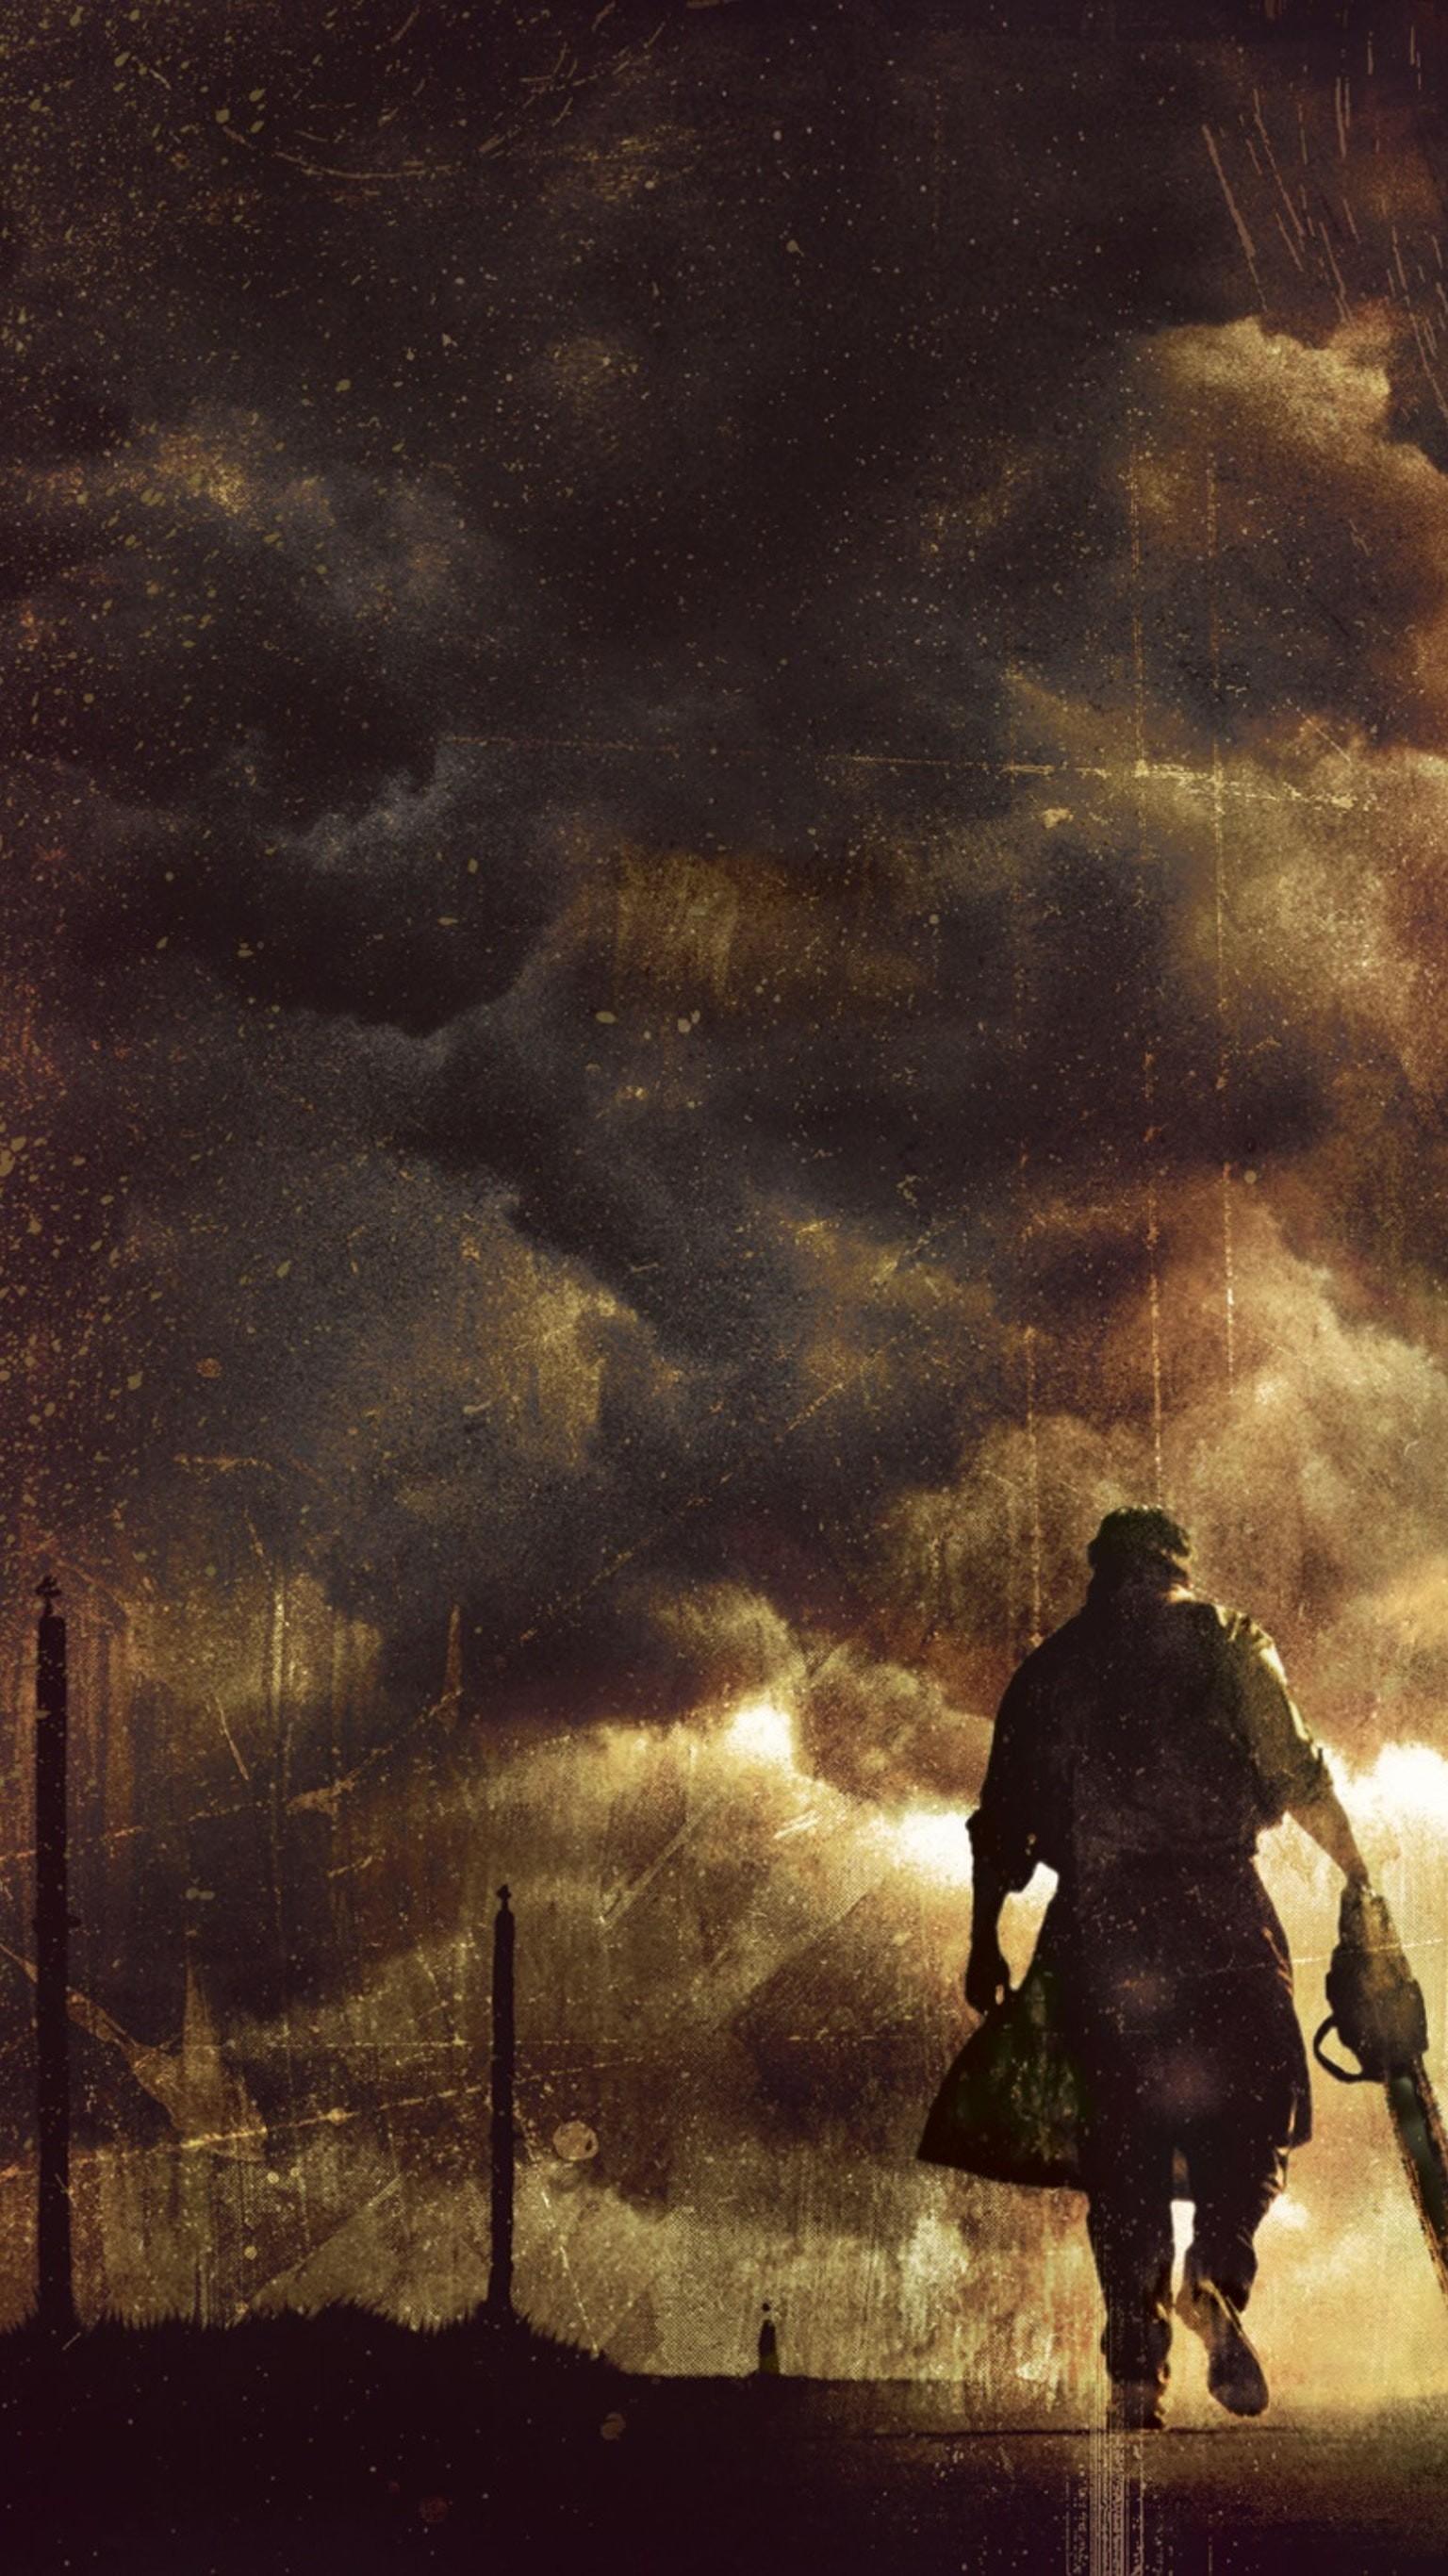 Res: 1536x2732, Texas Chainsaw Massacre HD Widescreen Image Download, Krysten Link